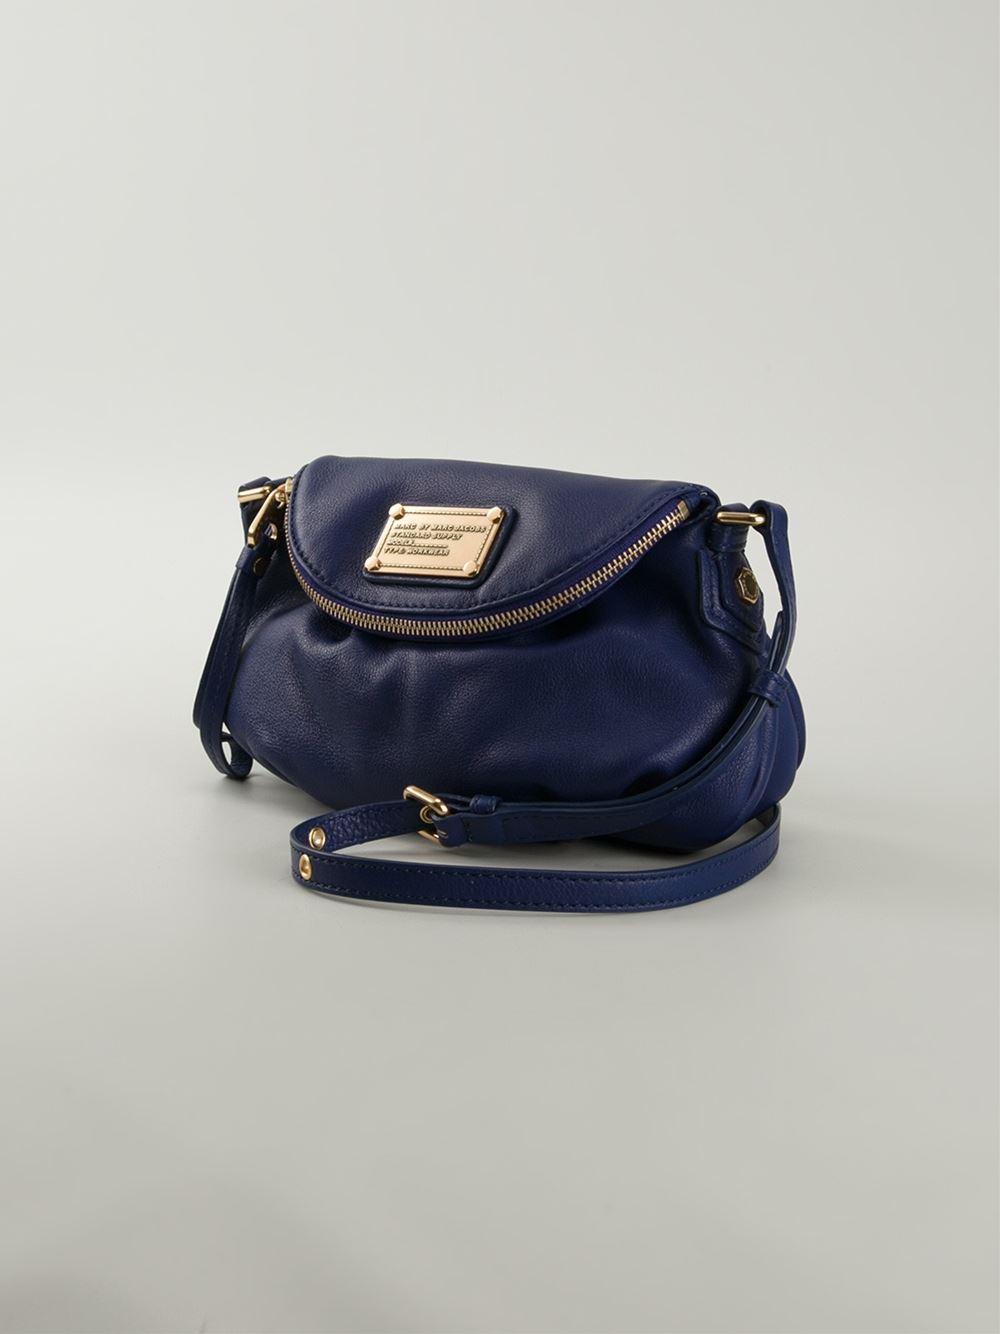 36457383860a Lyst - Marc By Marc Jacobs  Classic Q Mini Natasha  Crossbody Bag in ...